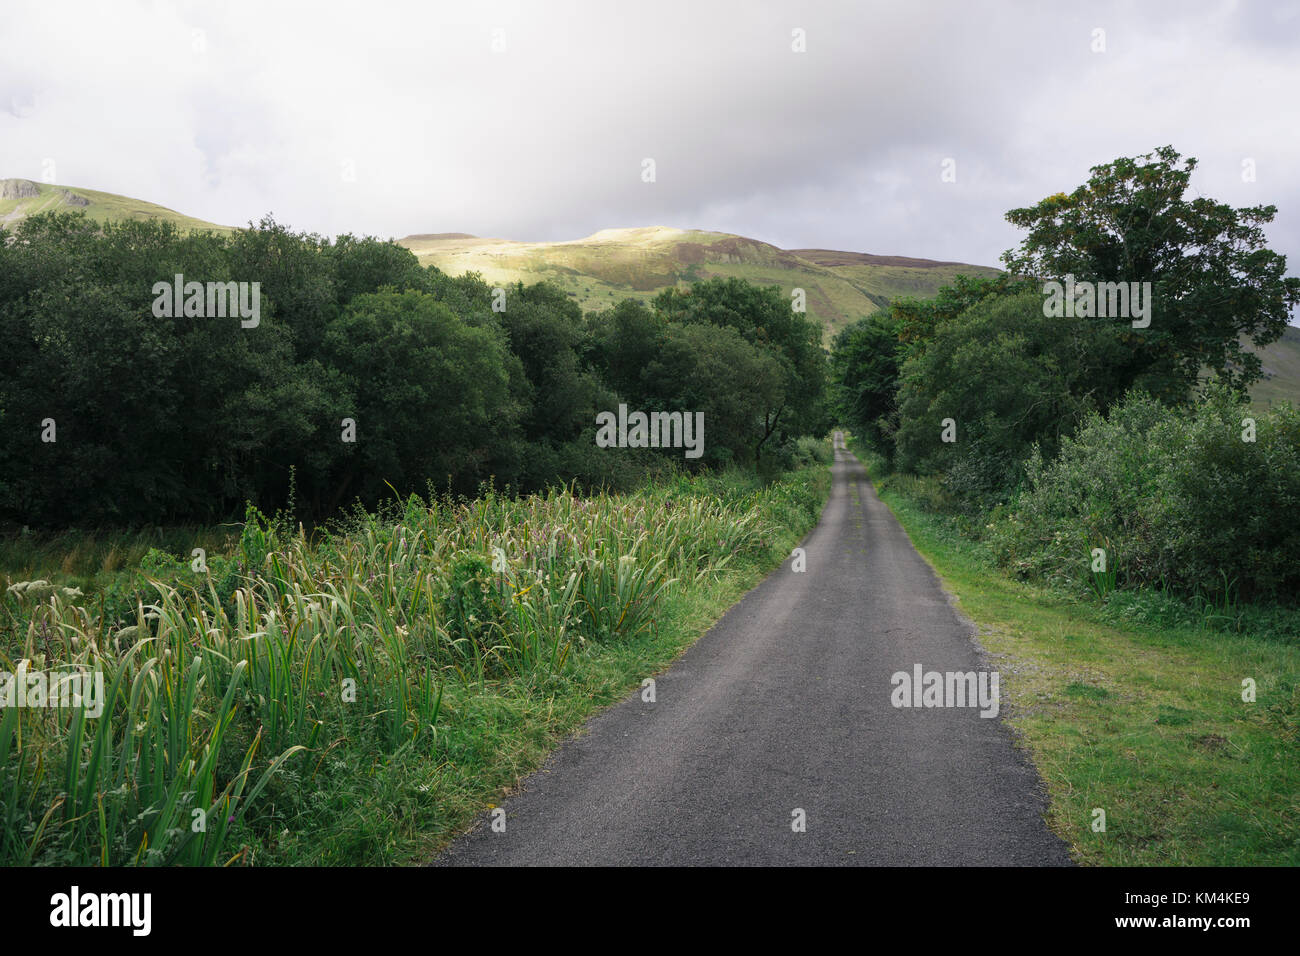 Rural single track road near Glenade, County Leitrim, Ireland. - Stock Image